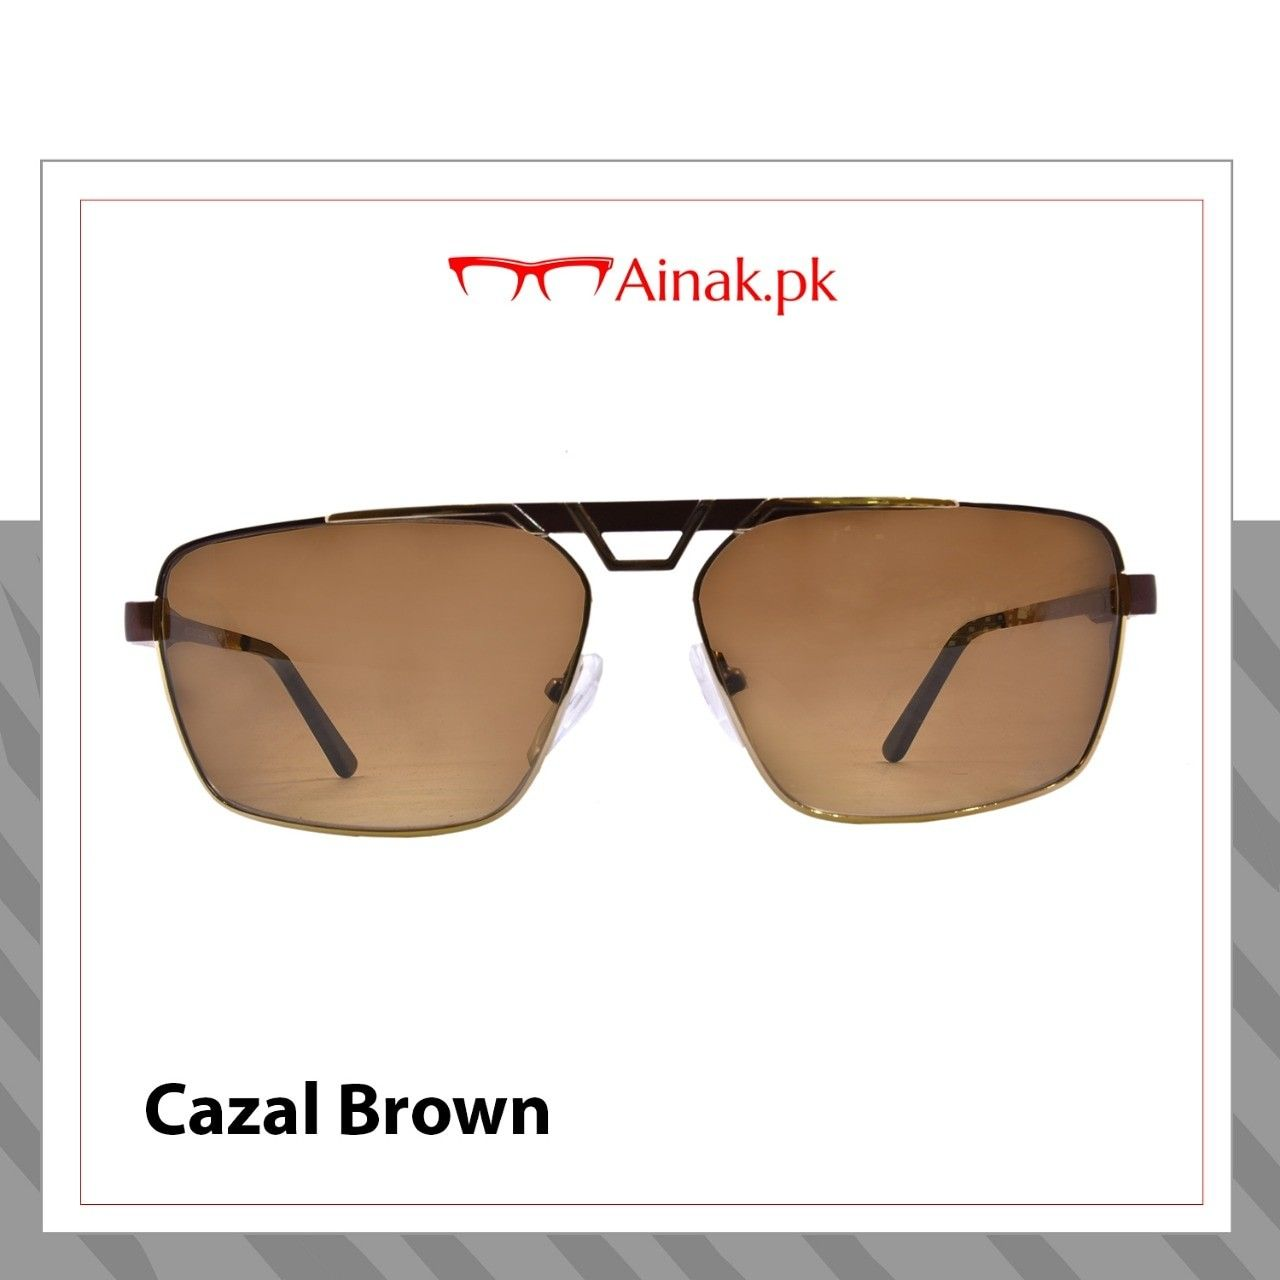 680d000f212 Buy yours  www.ainak.pk Contact  +92-322-5705757  sunglasses  shades   fashionwear  sunglassesfashion  cazal  cazalshades  ainakpk  ainak